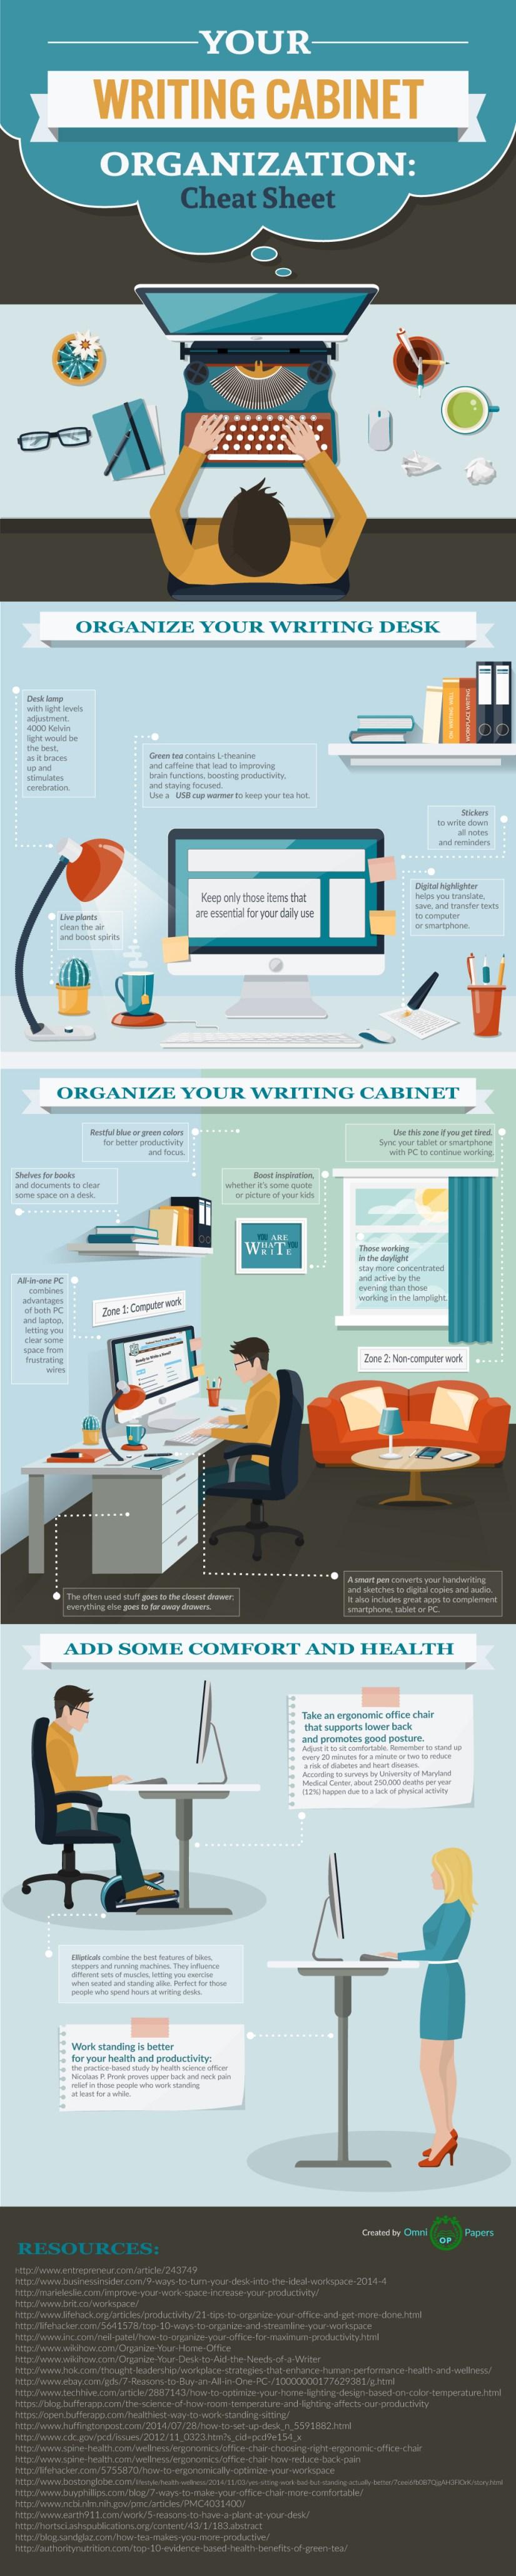 your-writing-cabinet-organization-techblogcorner